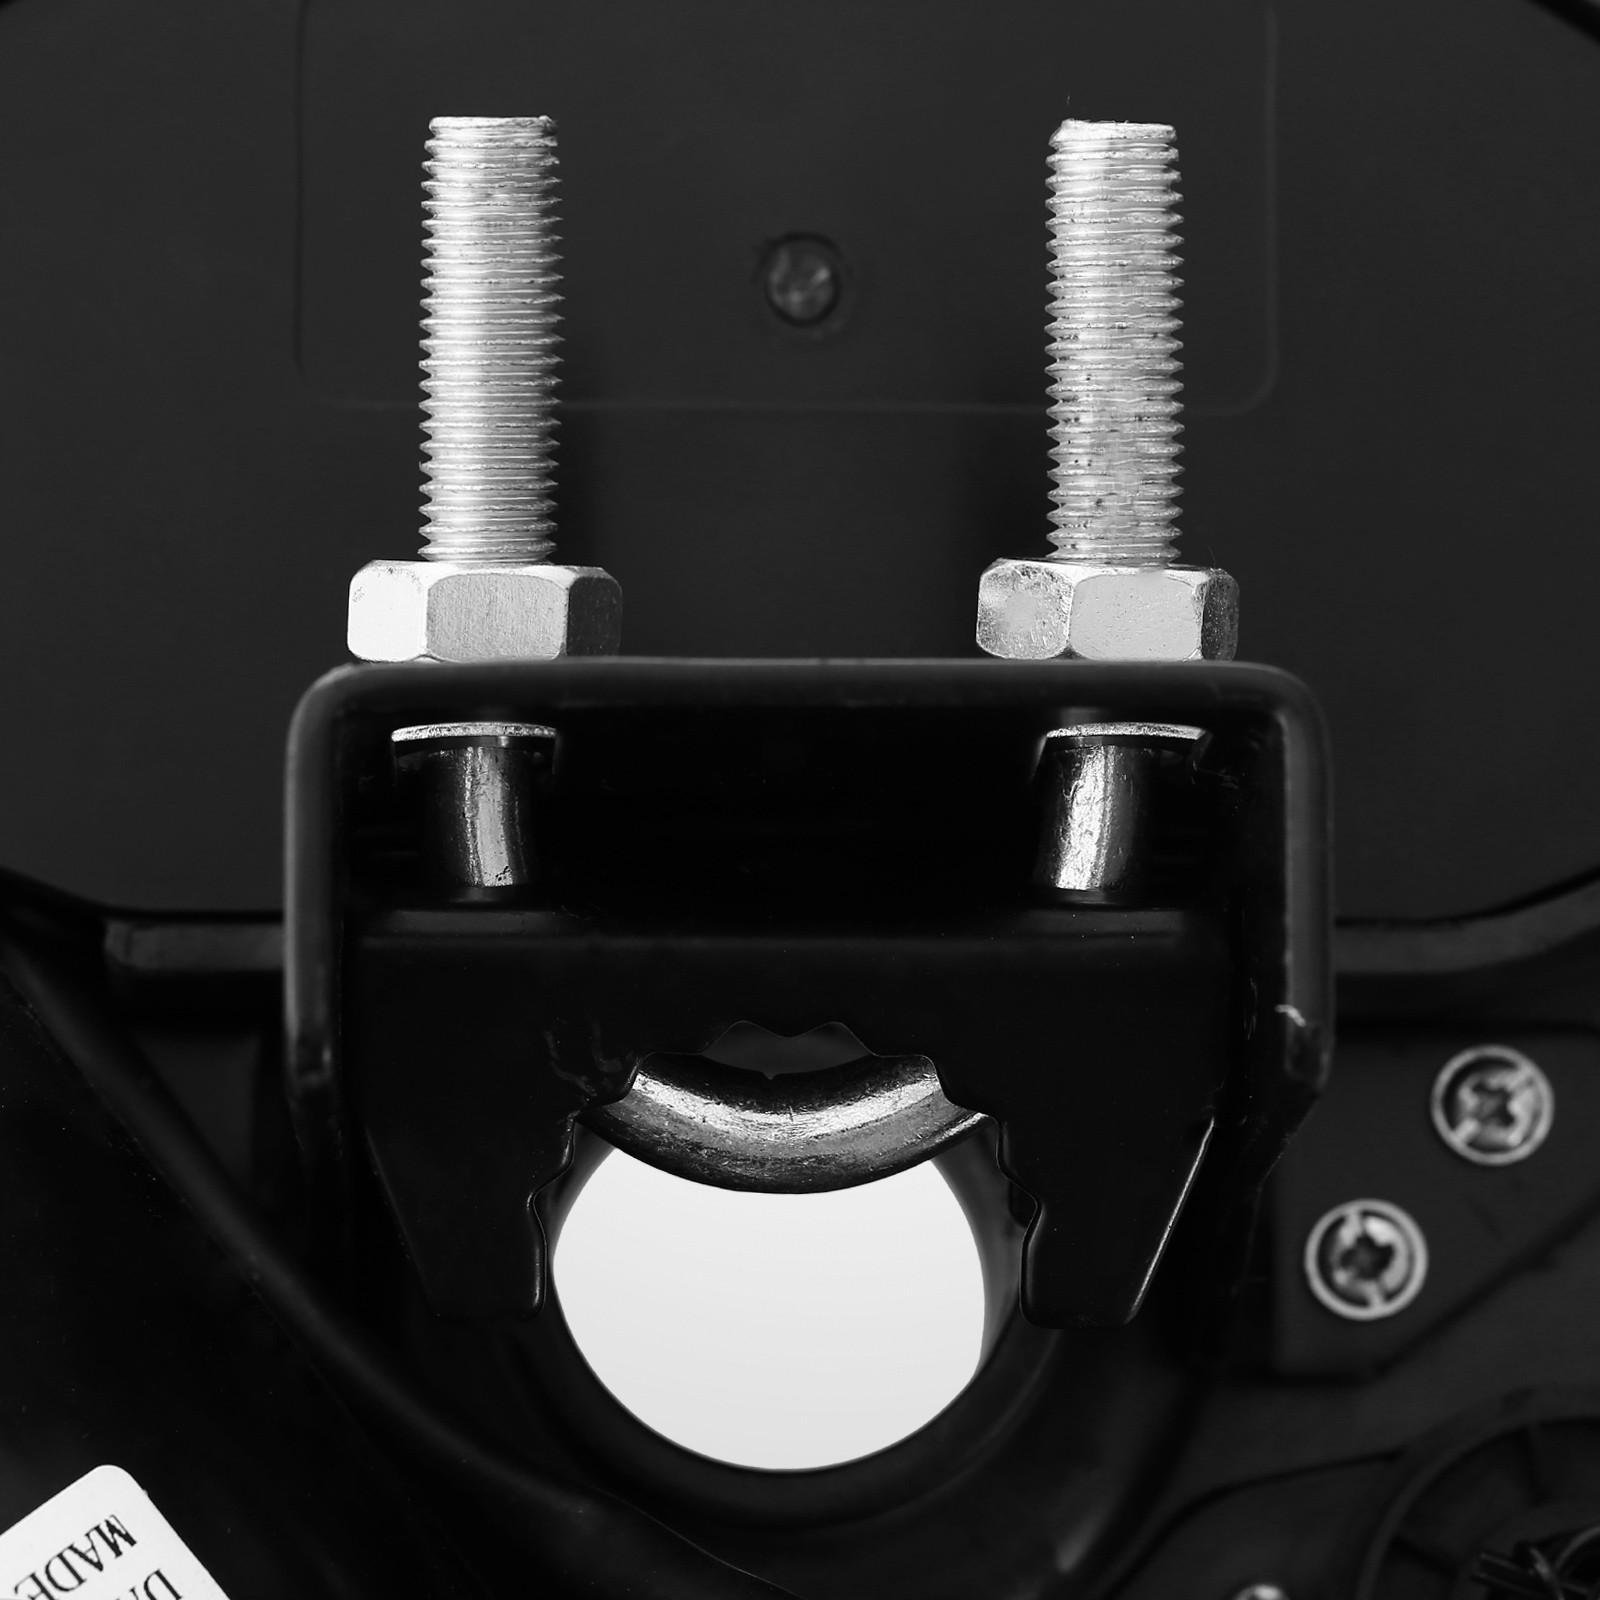 Automatic Garage Door Opener Roller Remote Stable LED